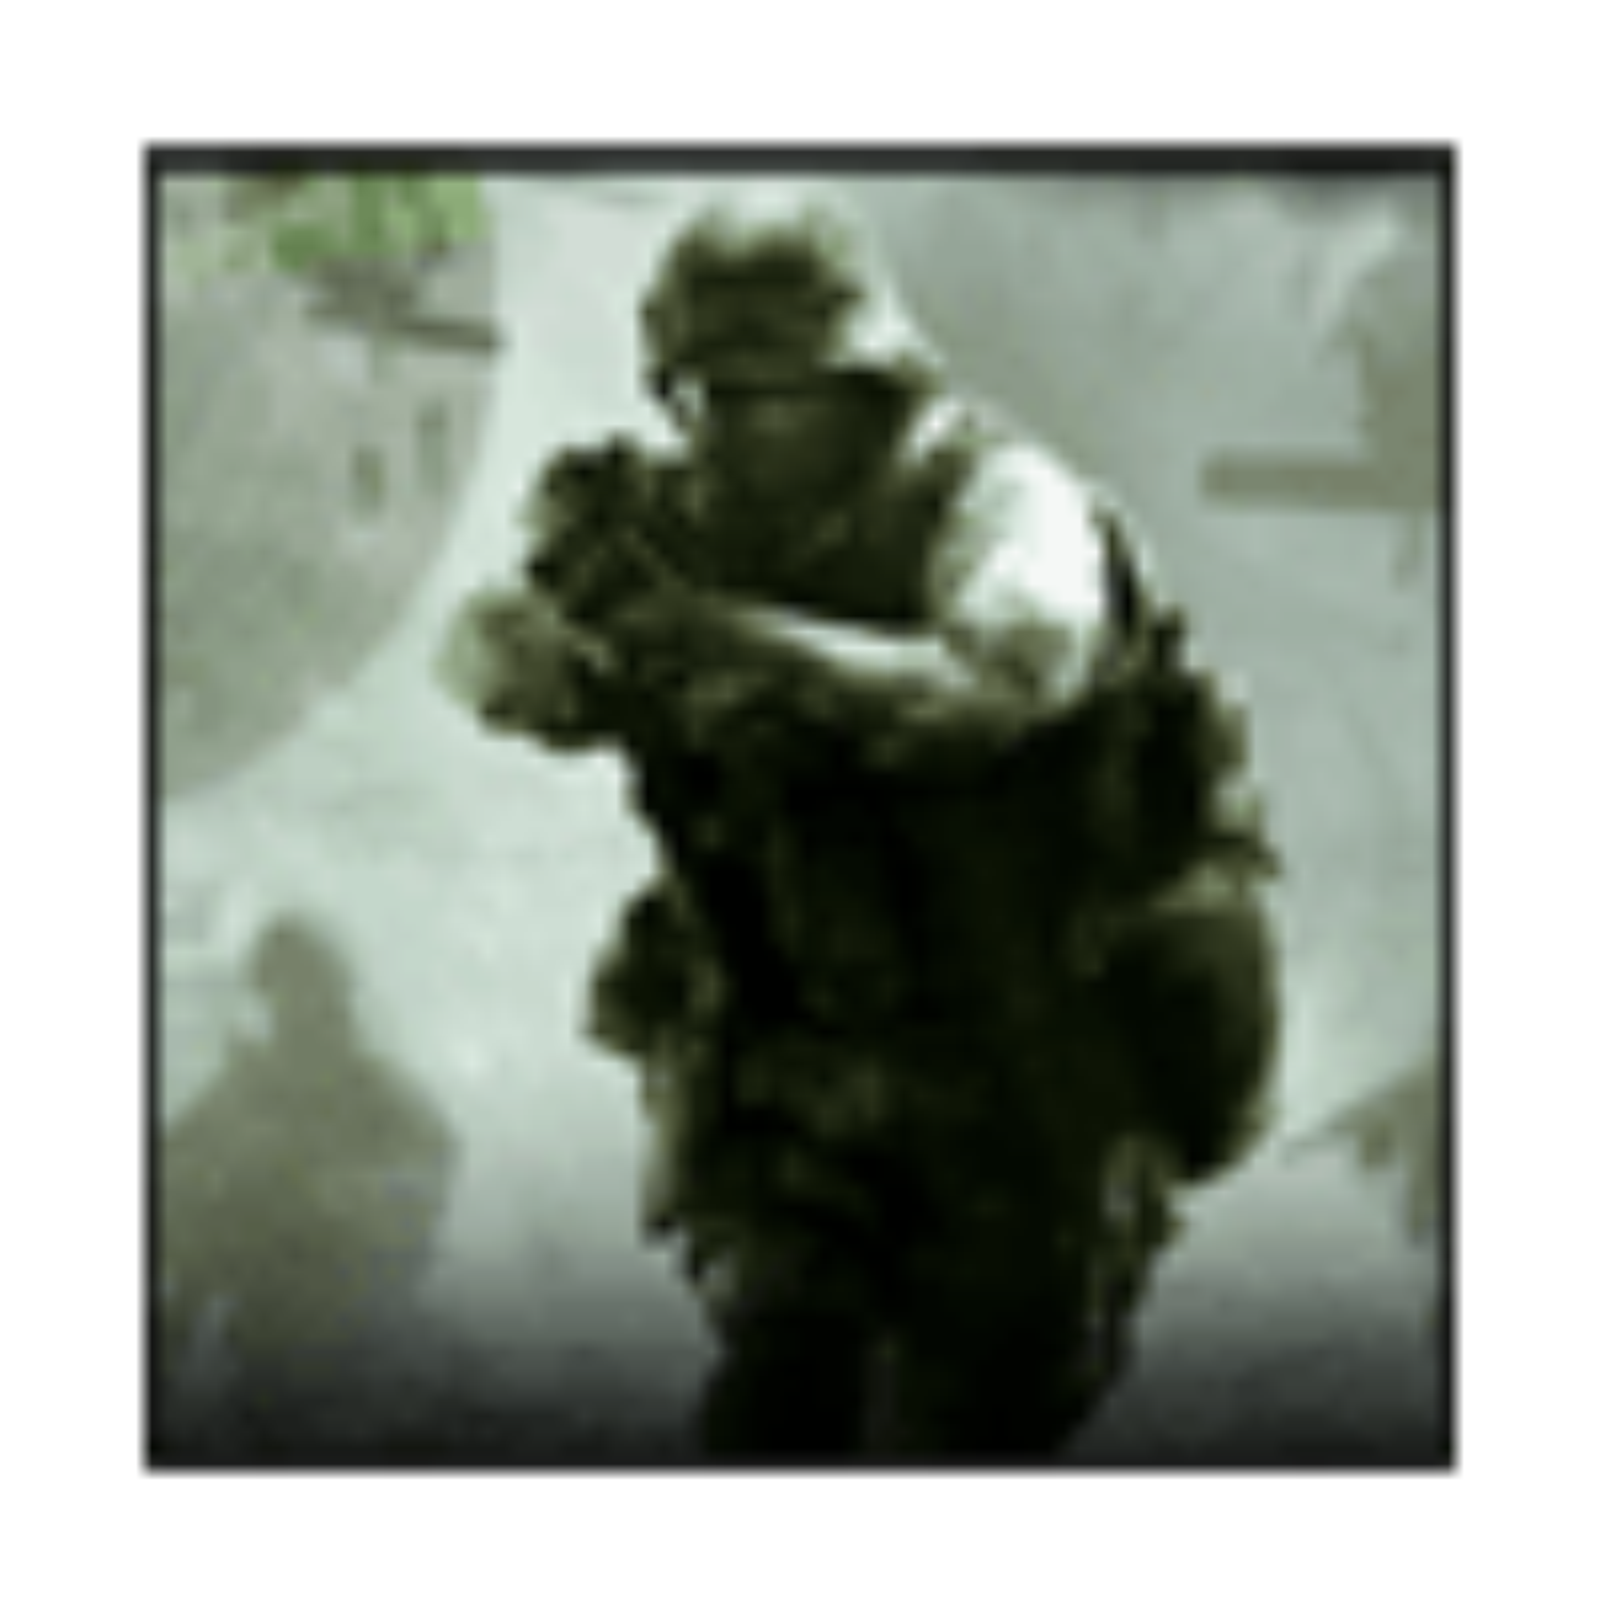 Call of Duty 4 Modern Warfare Patch